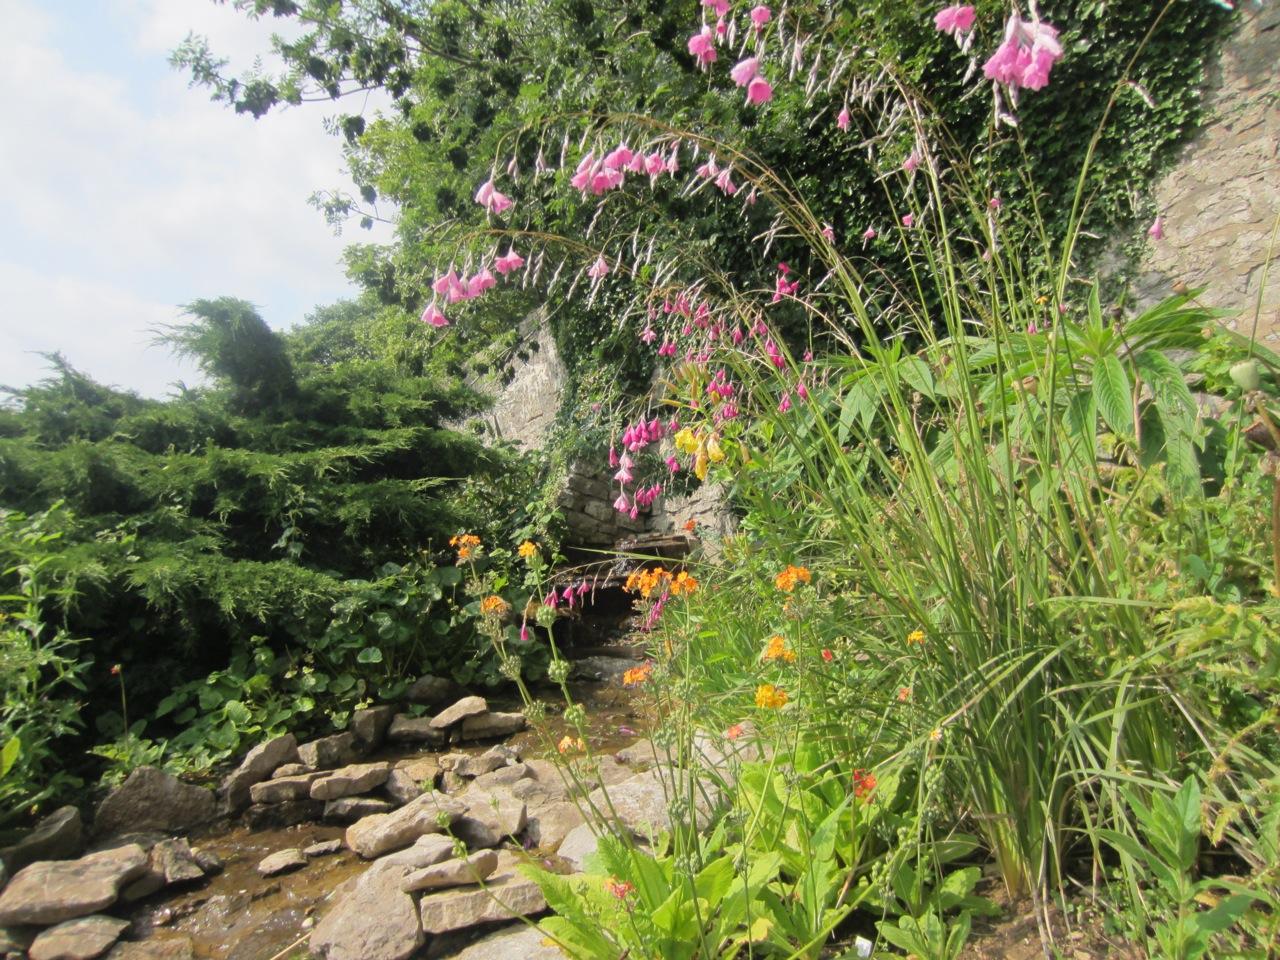 Slade Garden image 1.jpeg